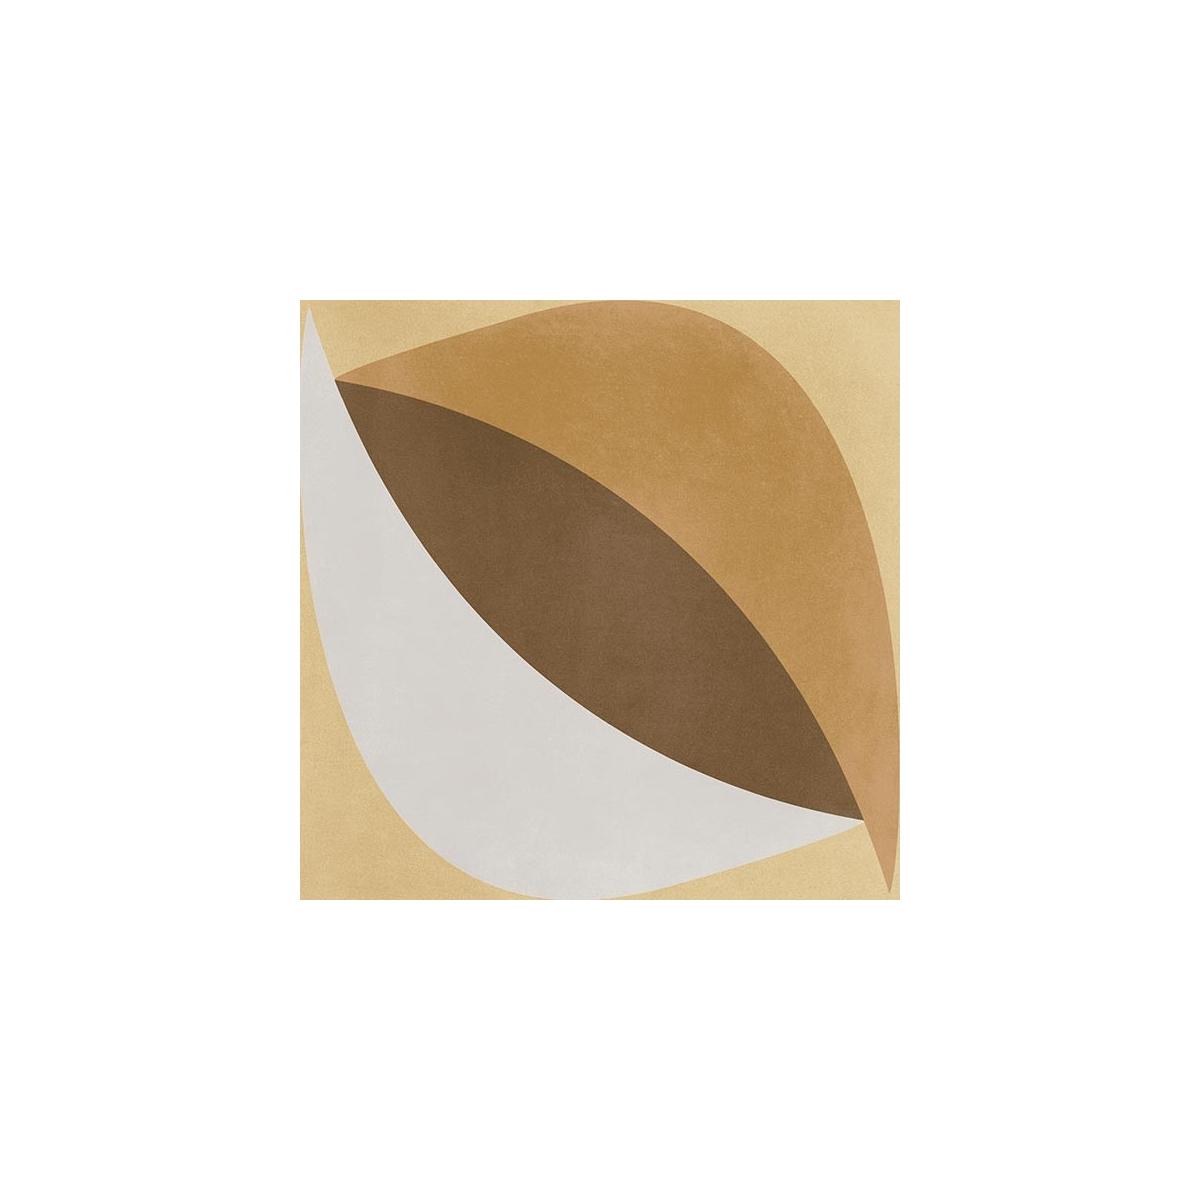 Afton 29.3x29.3 (caja) - Pavimento hidráulico porcelánico